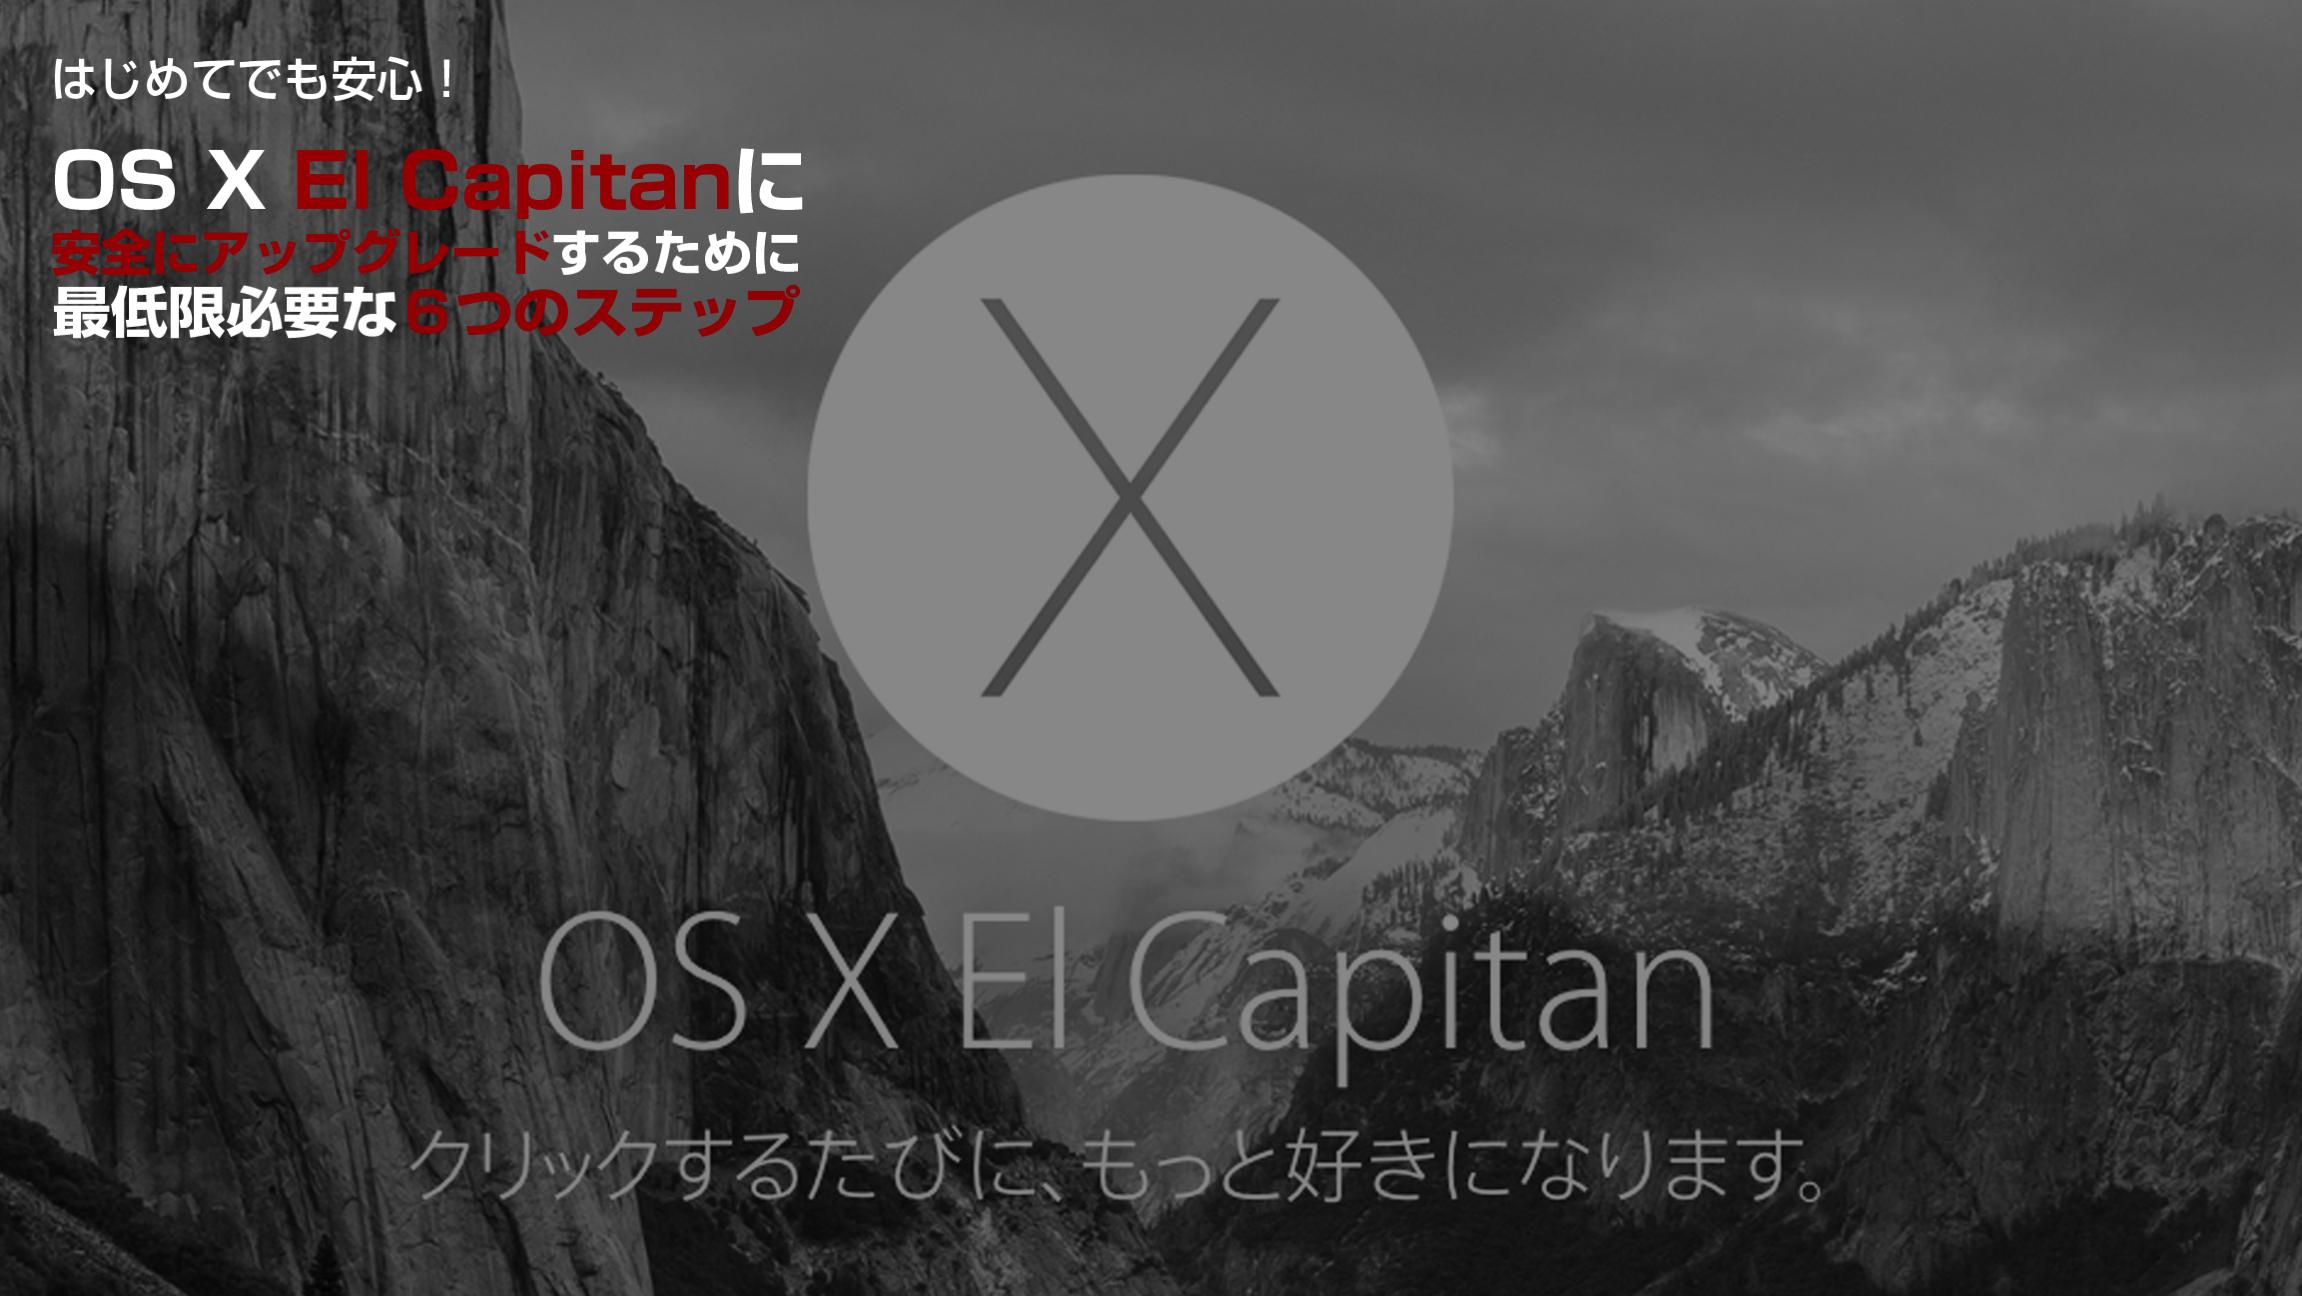 os-xel-capitan(エル・キャピタン)アップグレード方法